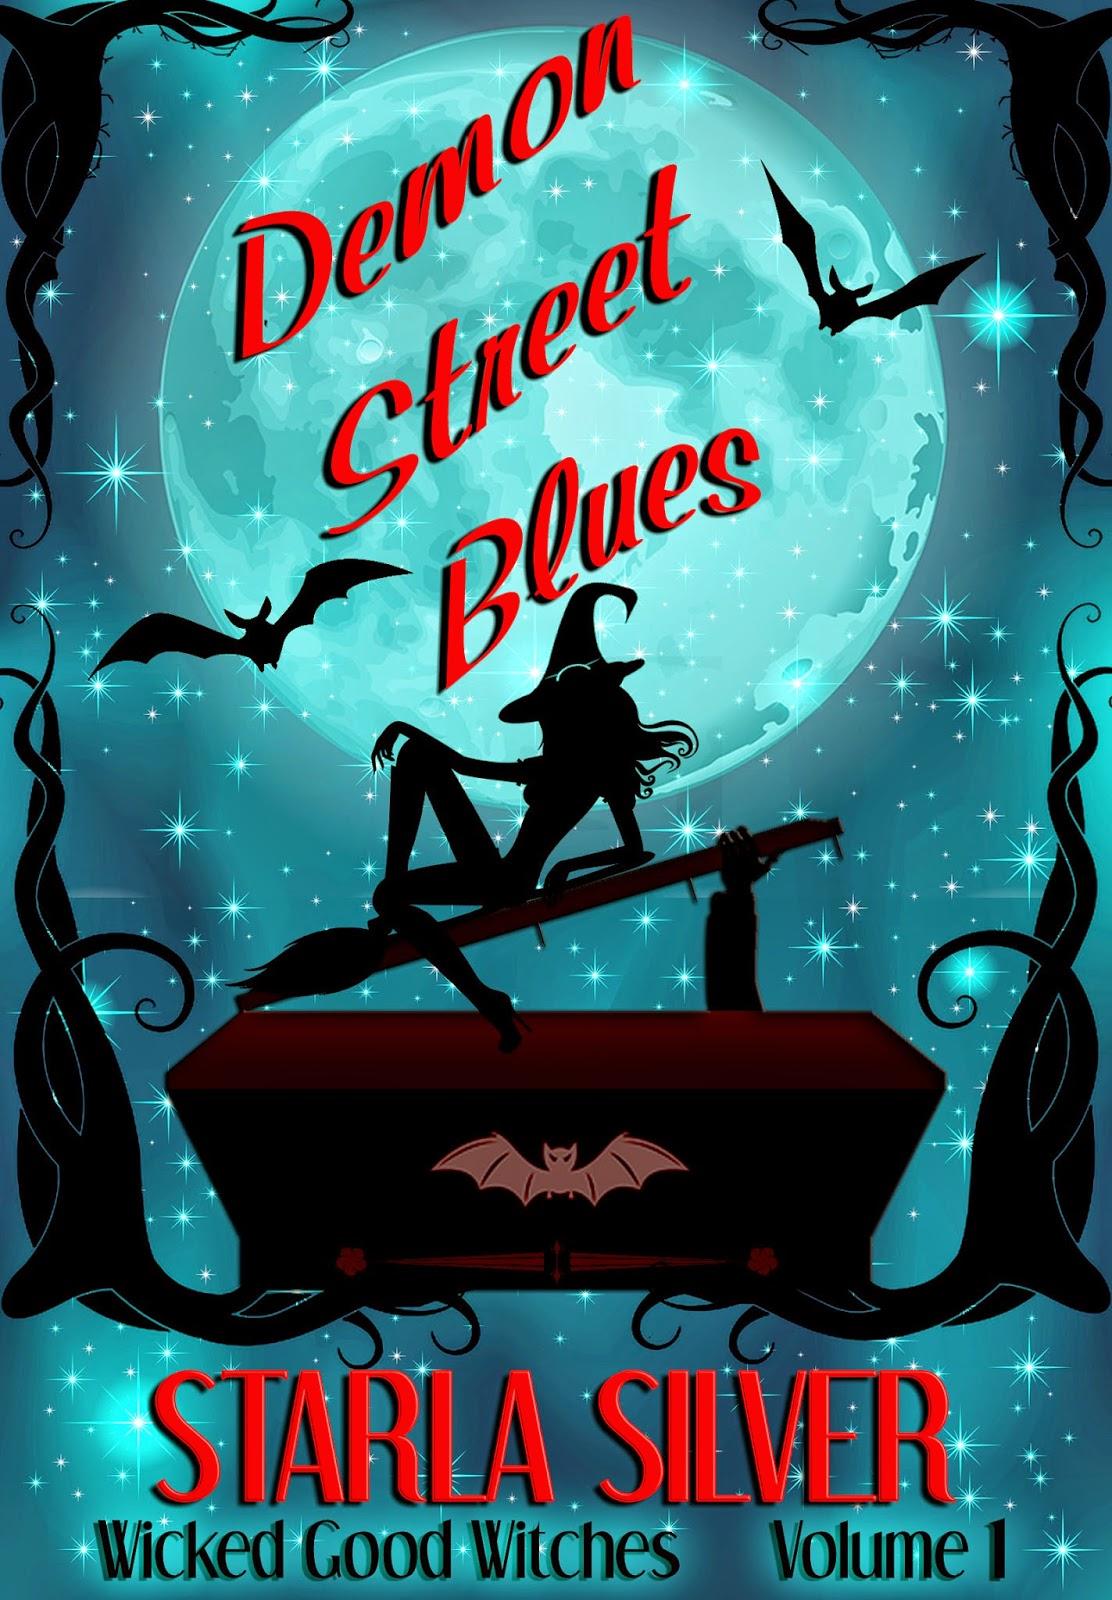 http://www.amazon.com/Demon-Street-Blues-Wicked-Witches-ebook/dp/B00PR9QKDU/ref=sr_1_1?s=books&ie=UTF8&qid=1416279283&sr=1-1&keywords=starla+silver